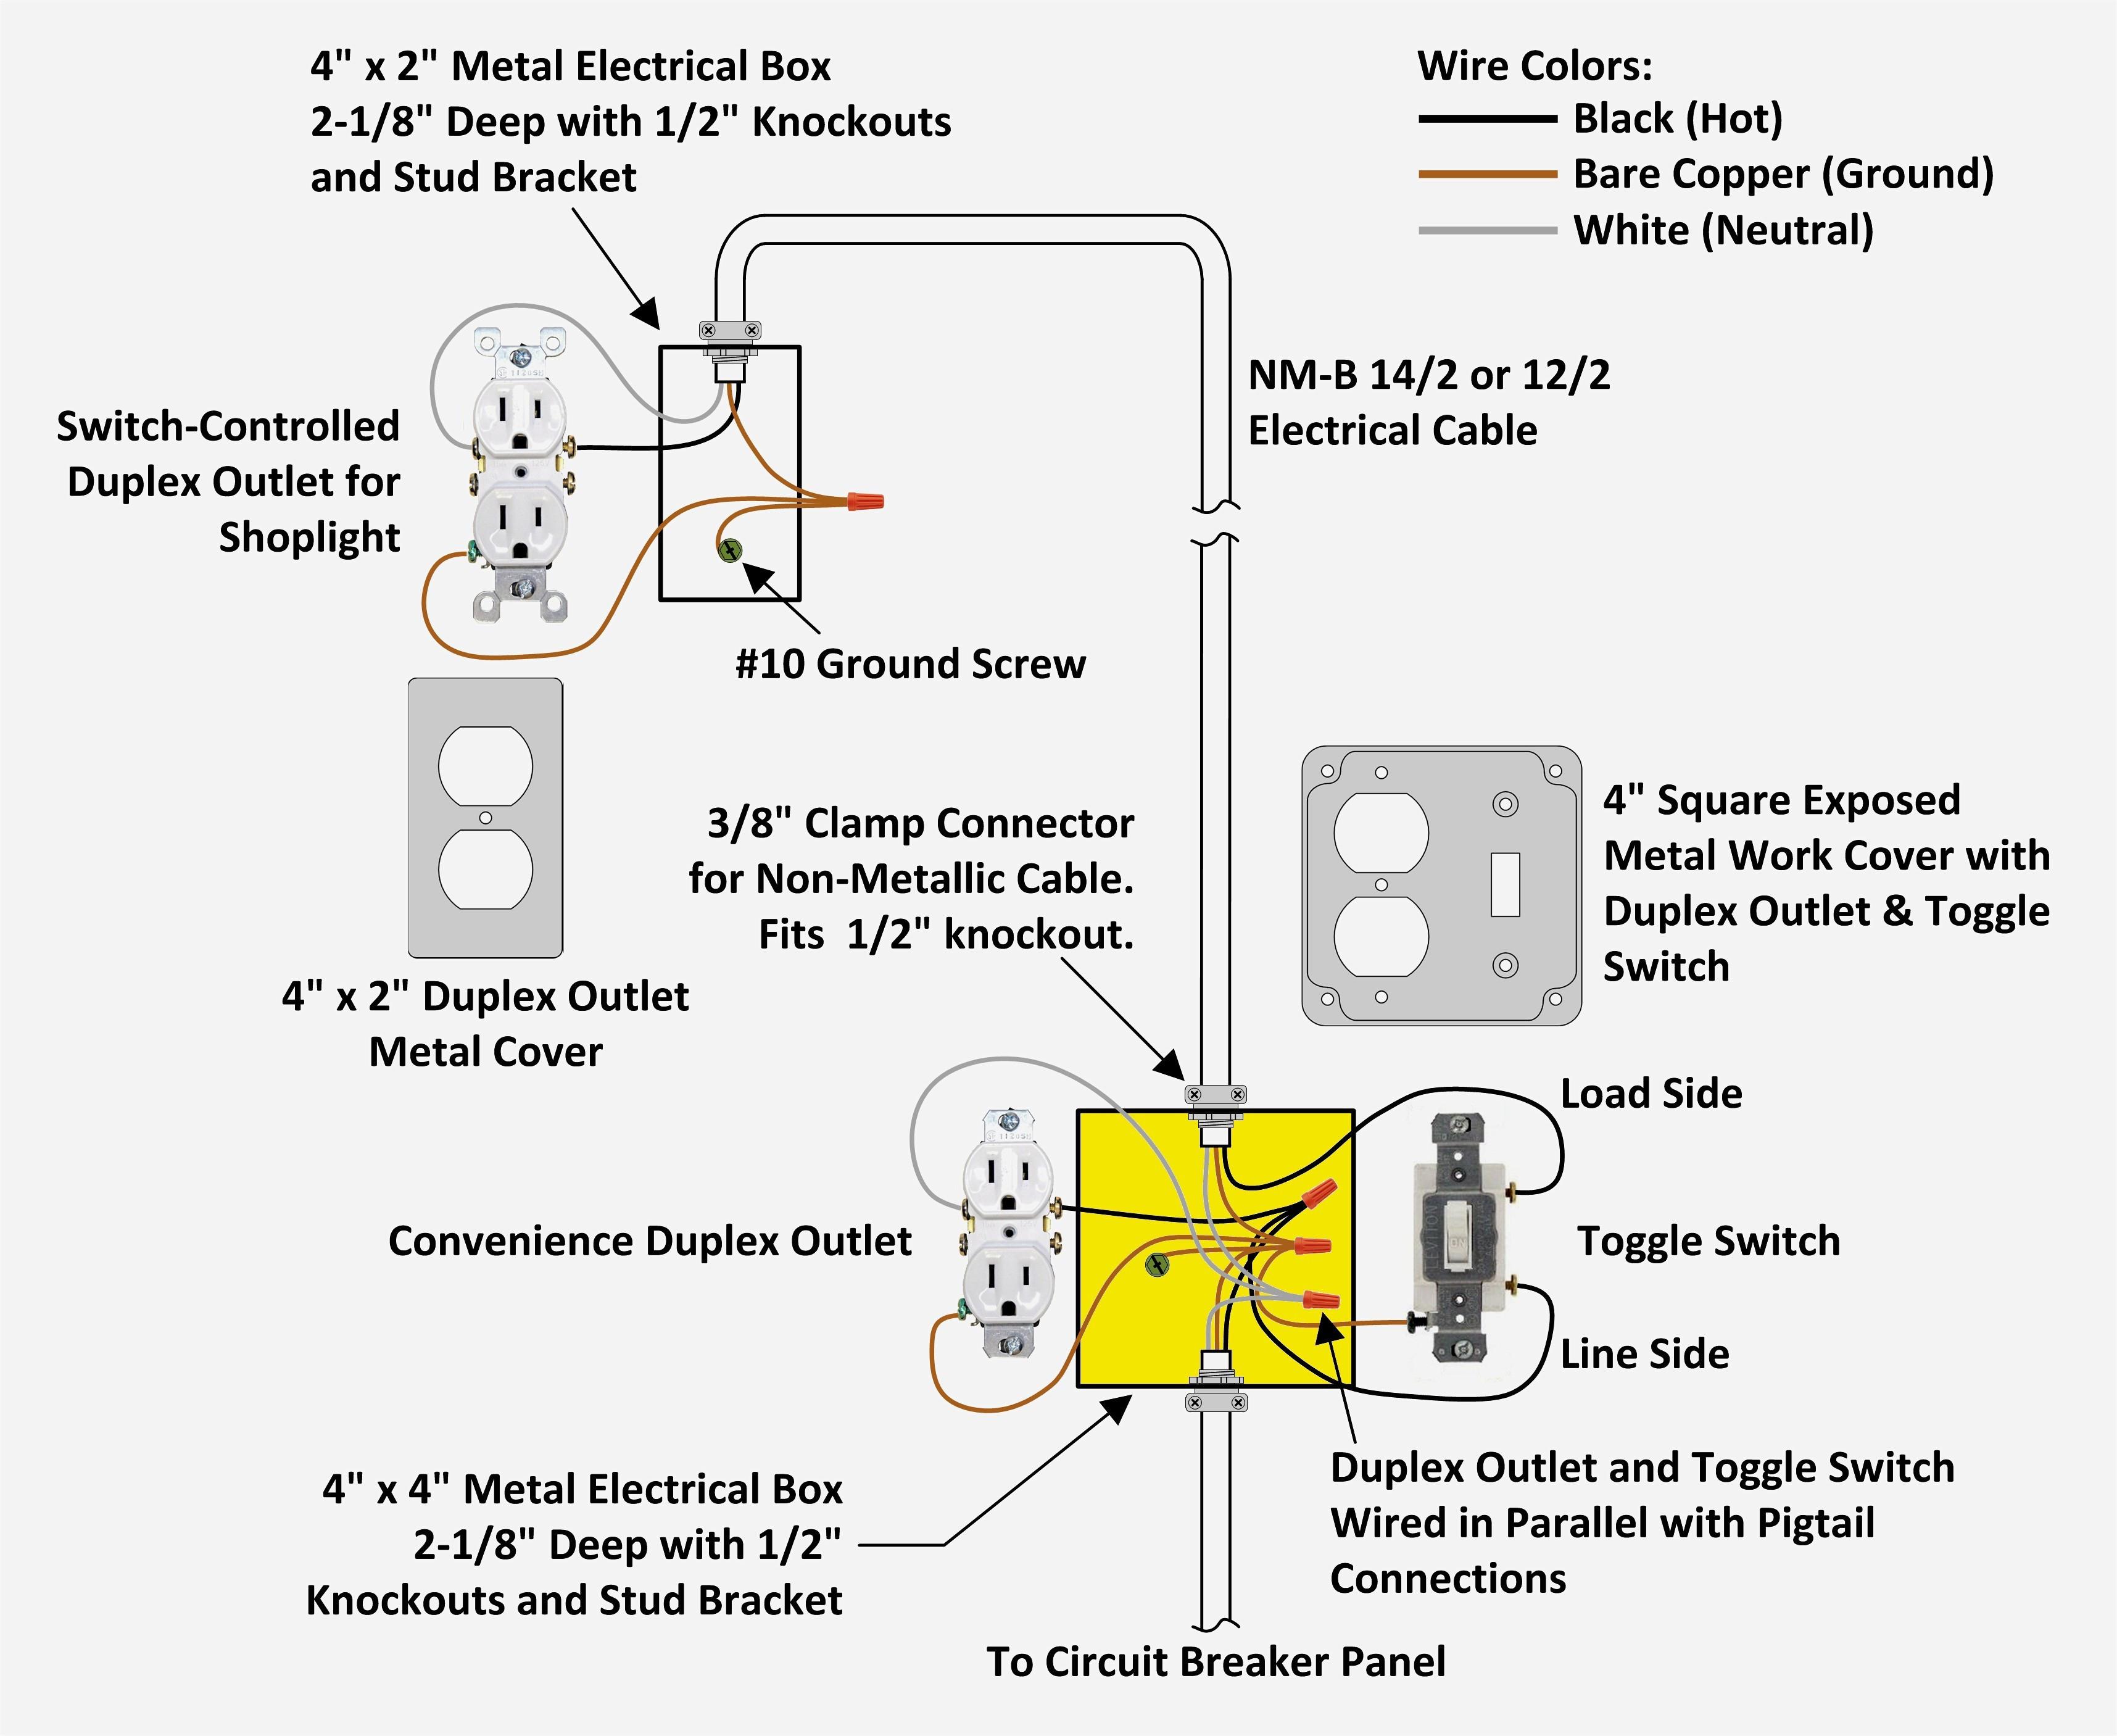 Wiring Diagram Single Pole Switch - Mikulskilawoffices - Double Pole Switch Wiring Diagram